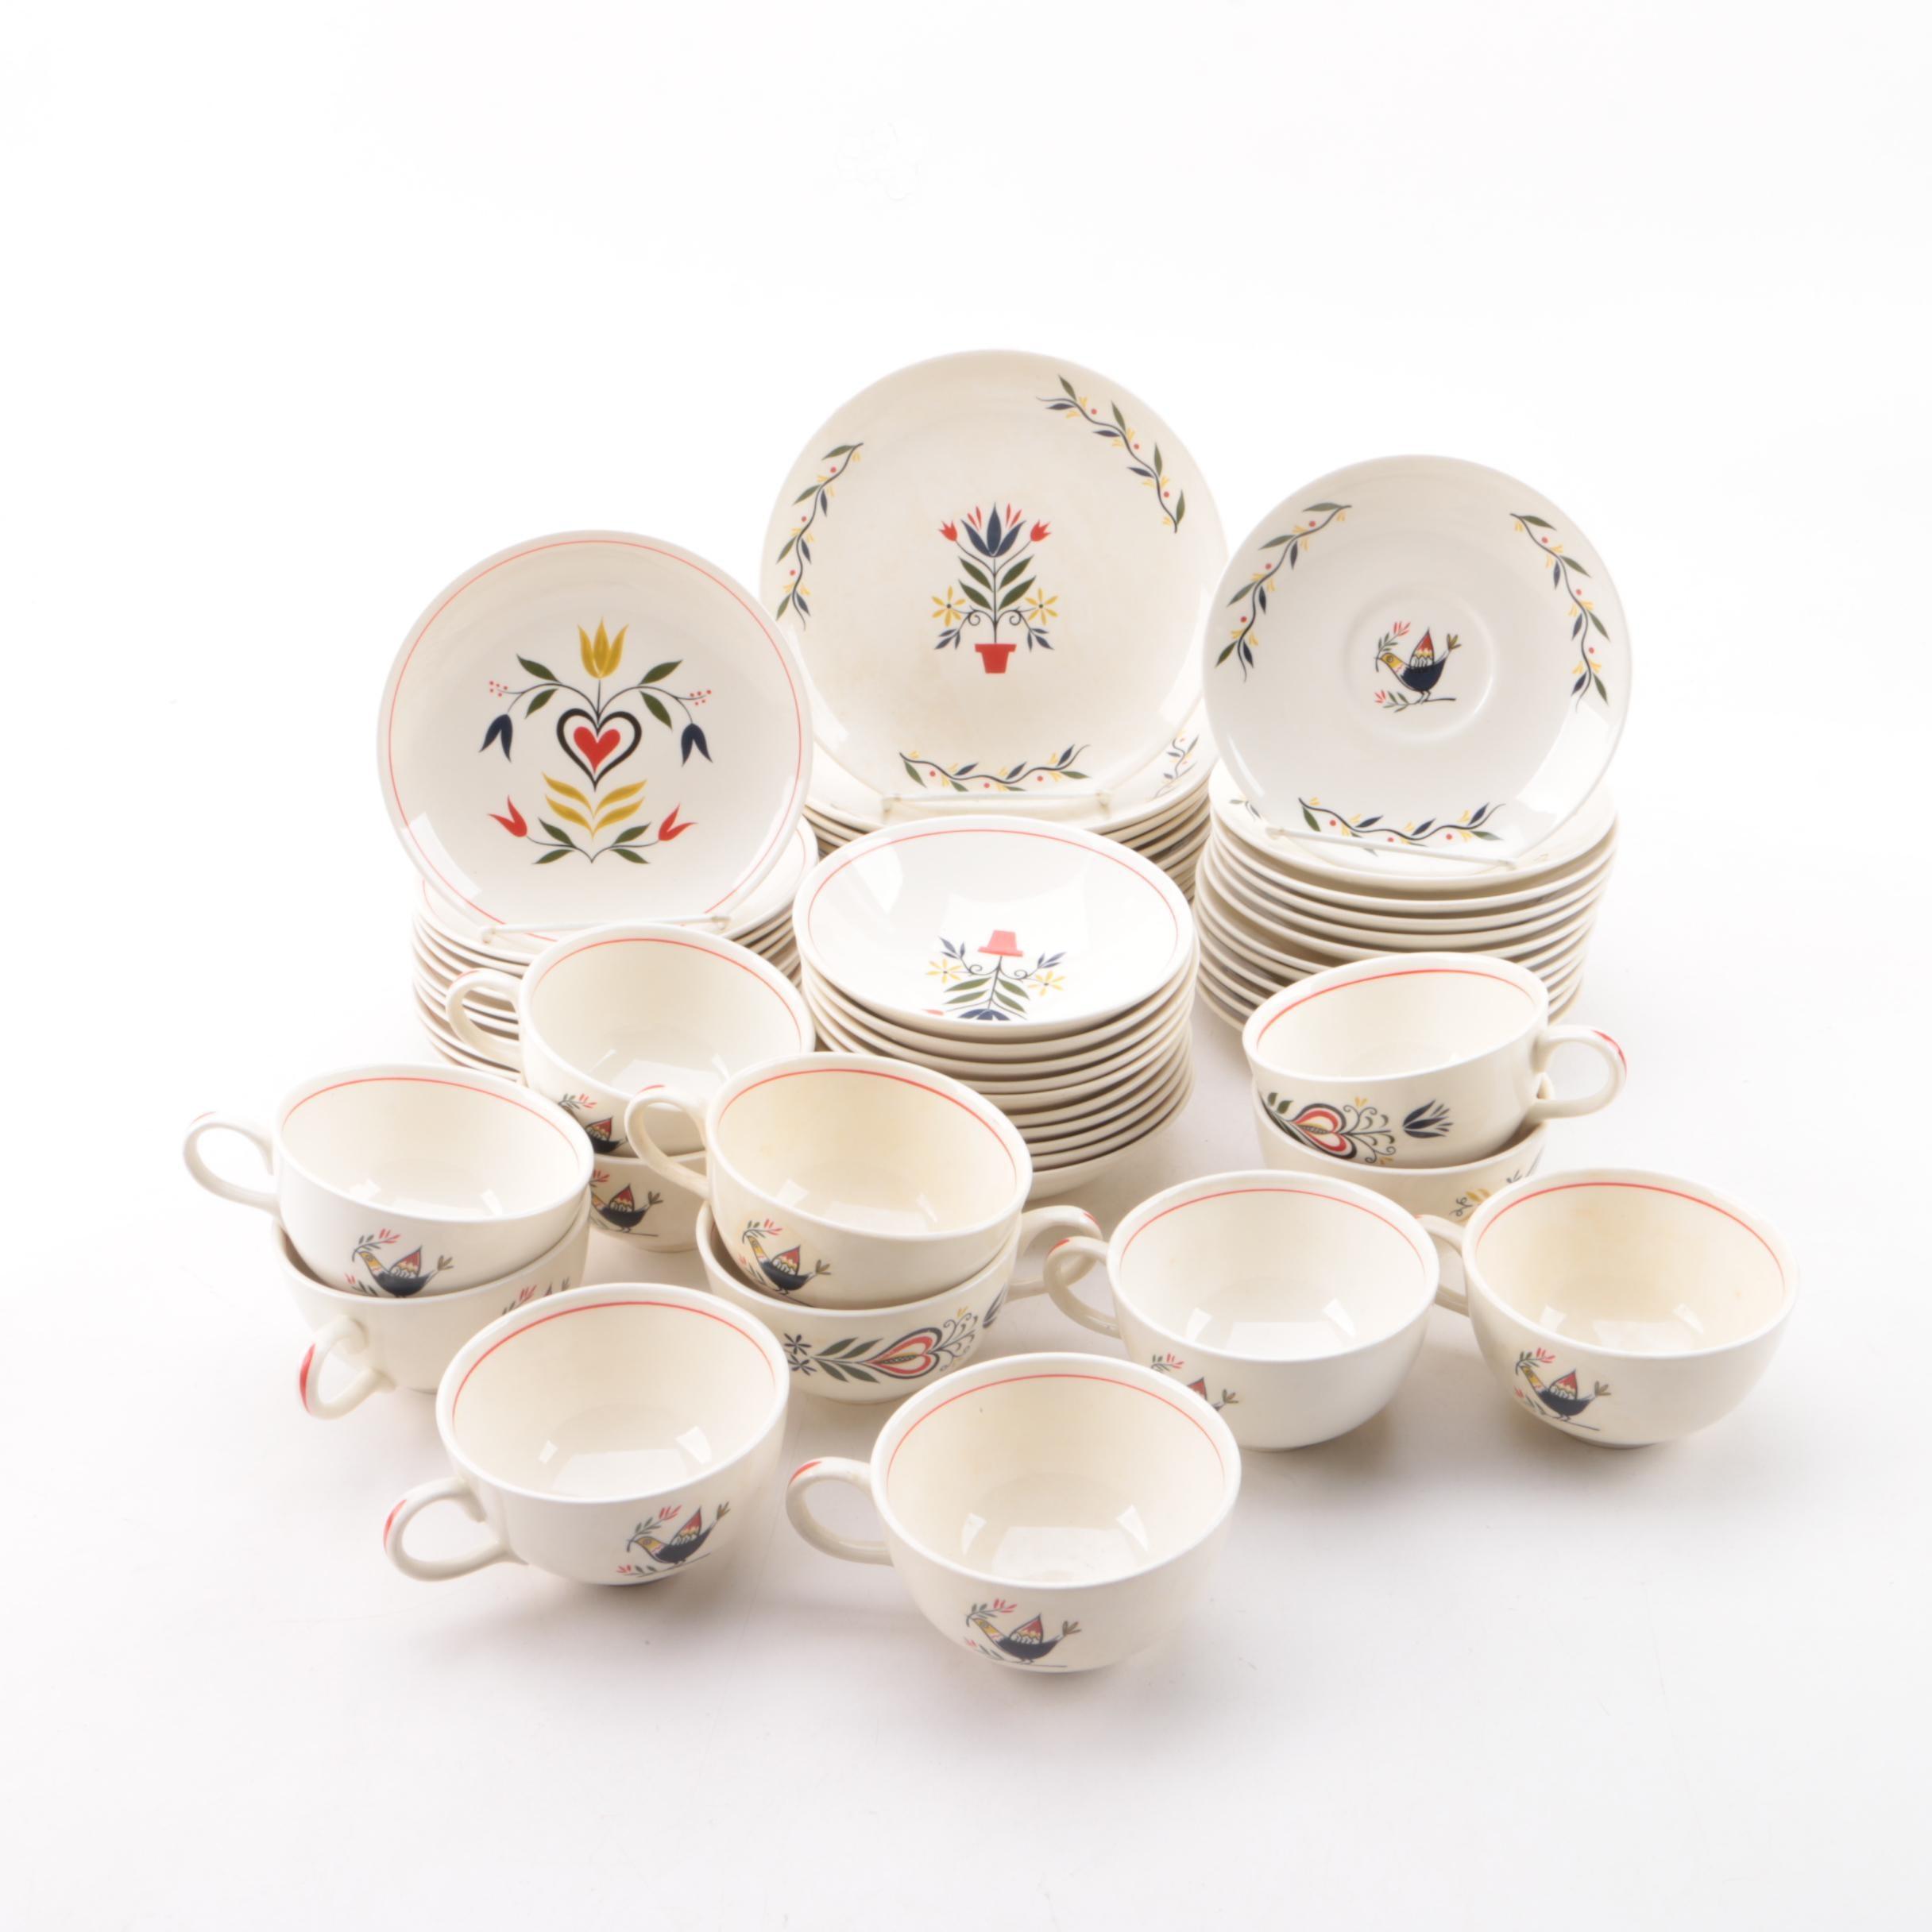 Vintage Scandinavian Inspired Ceramic Dinnerware